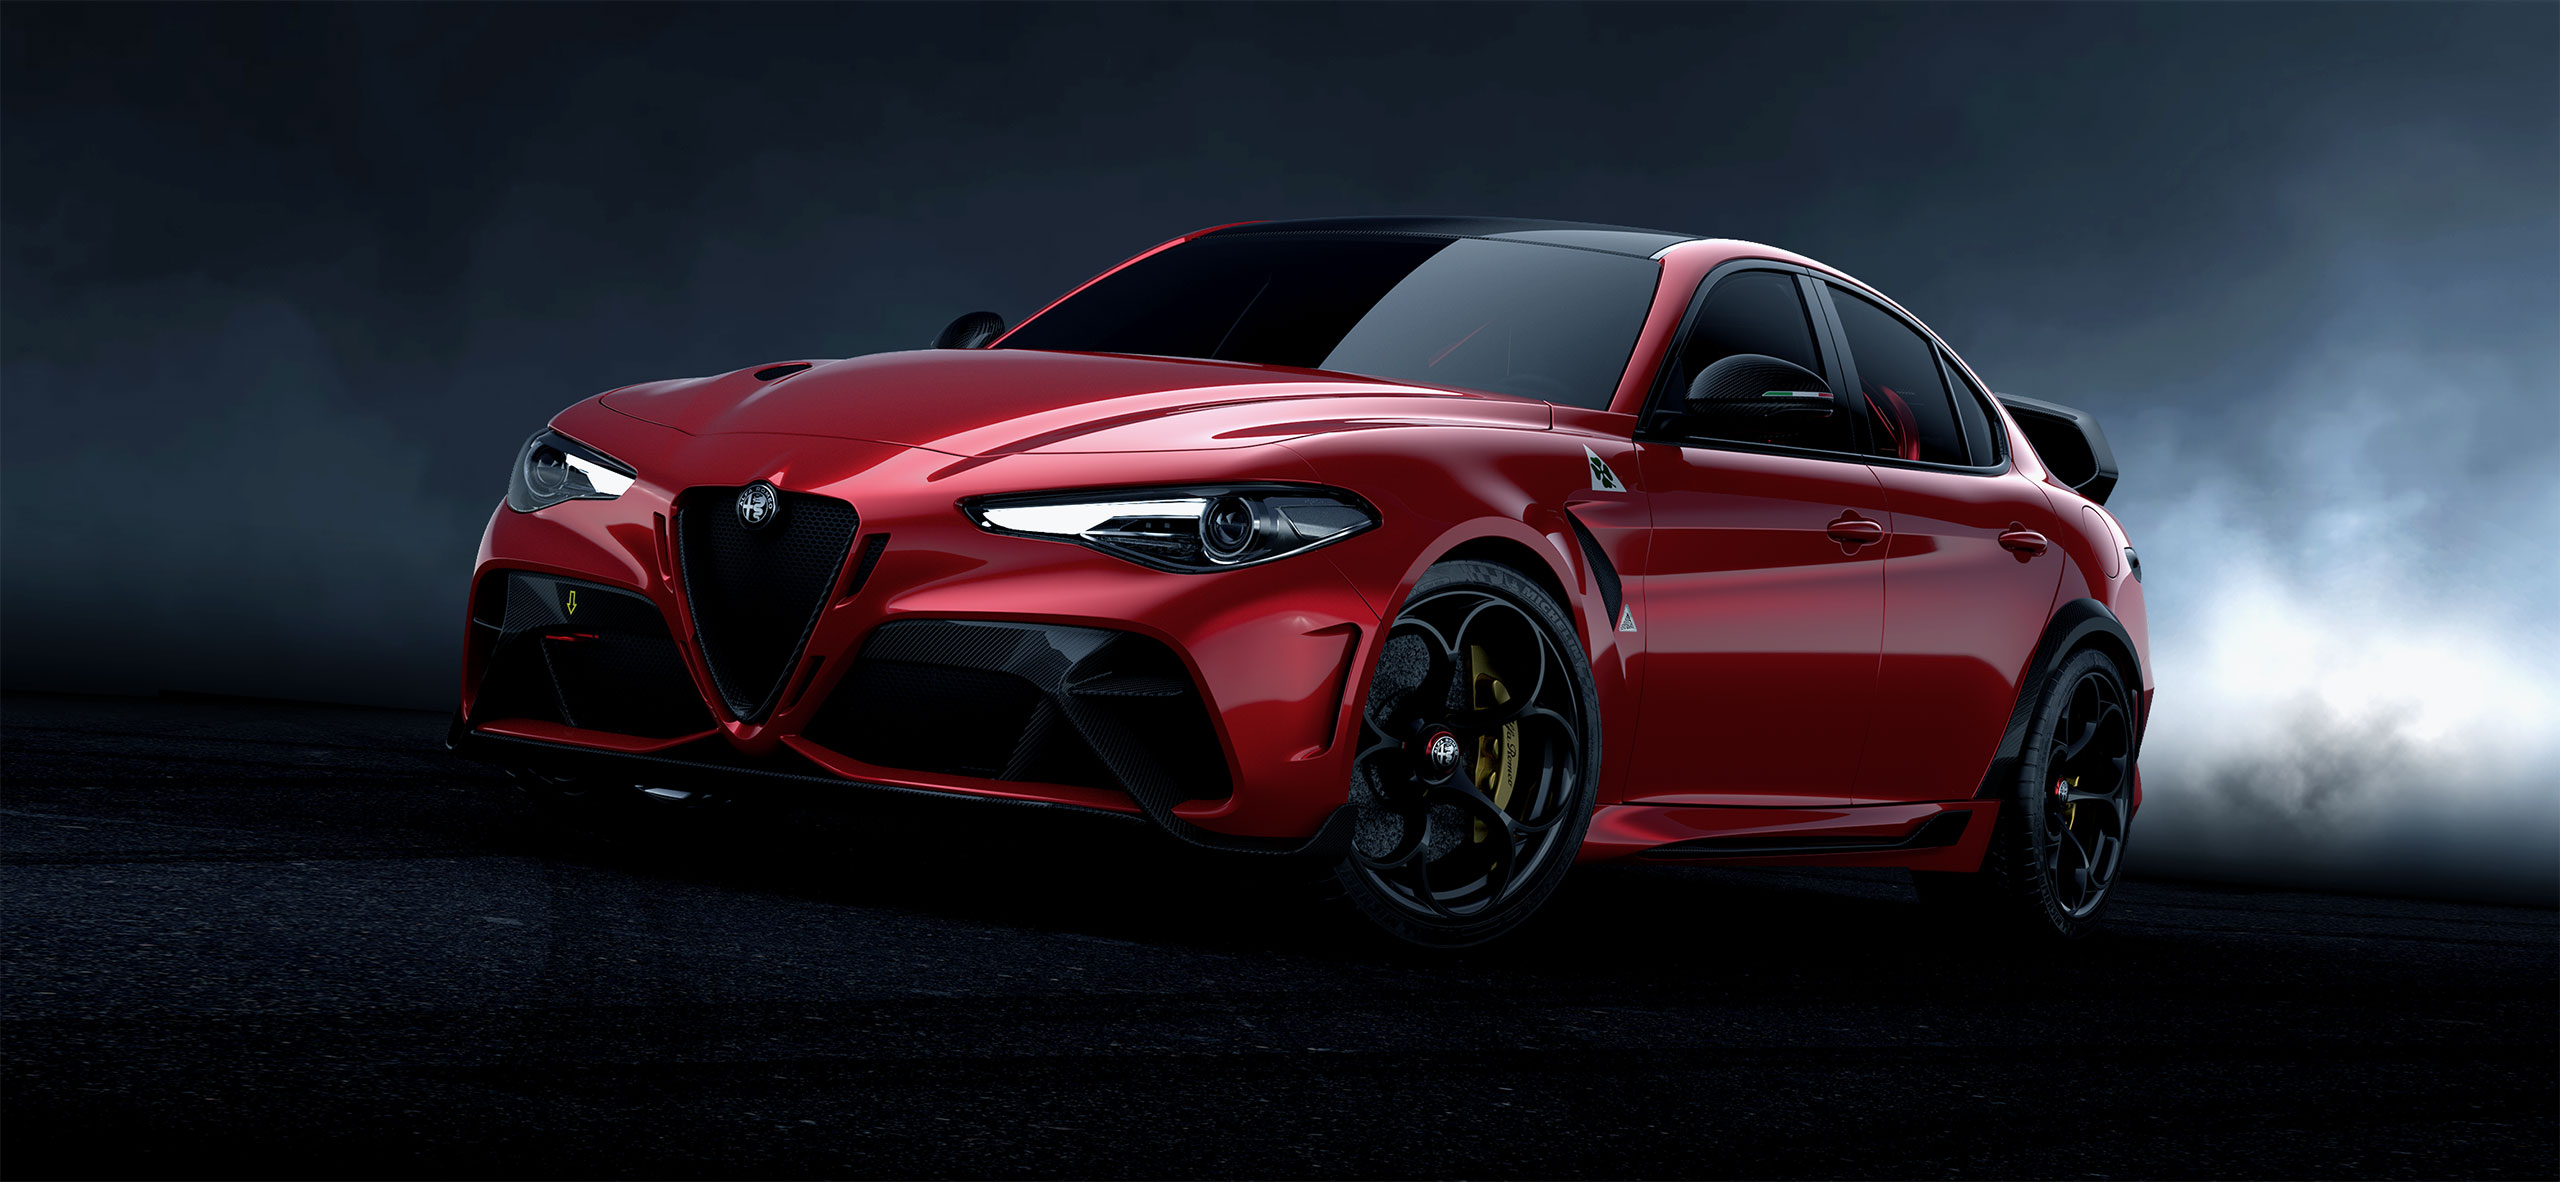 Prix des Alfa Romeo Giulia GTA et GTAm : le configurateur ...